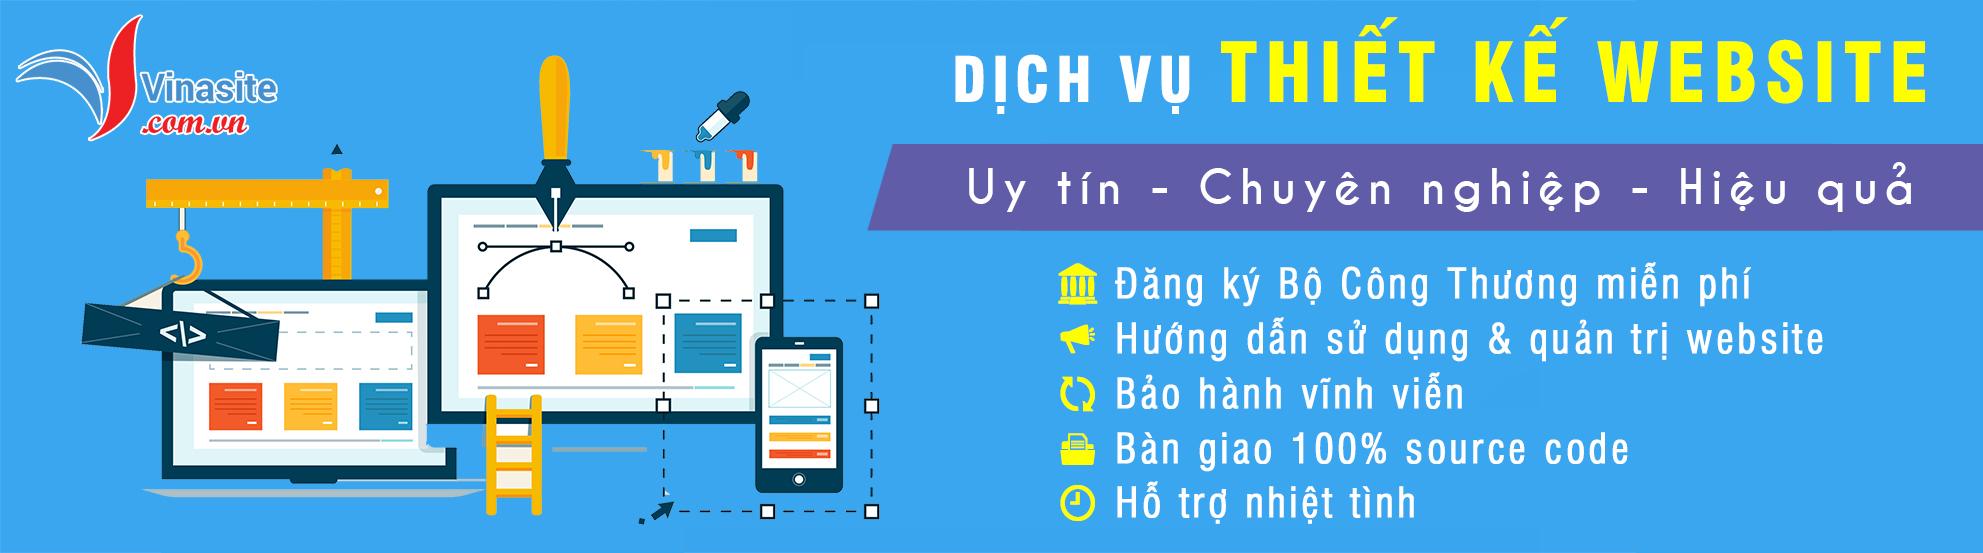 bnn vinasite4 - Thiết Kế Website